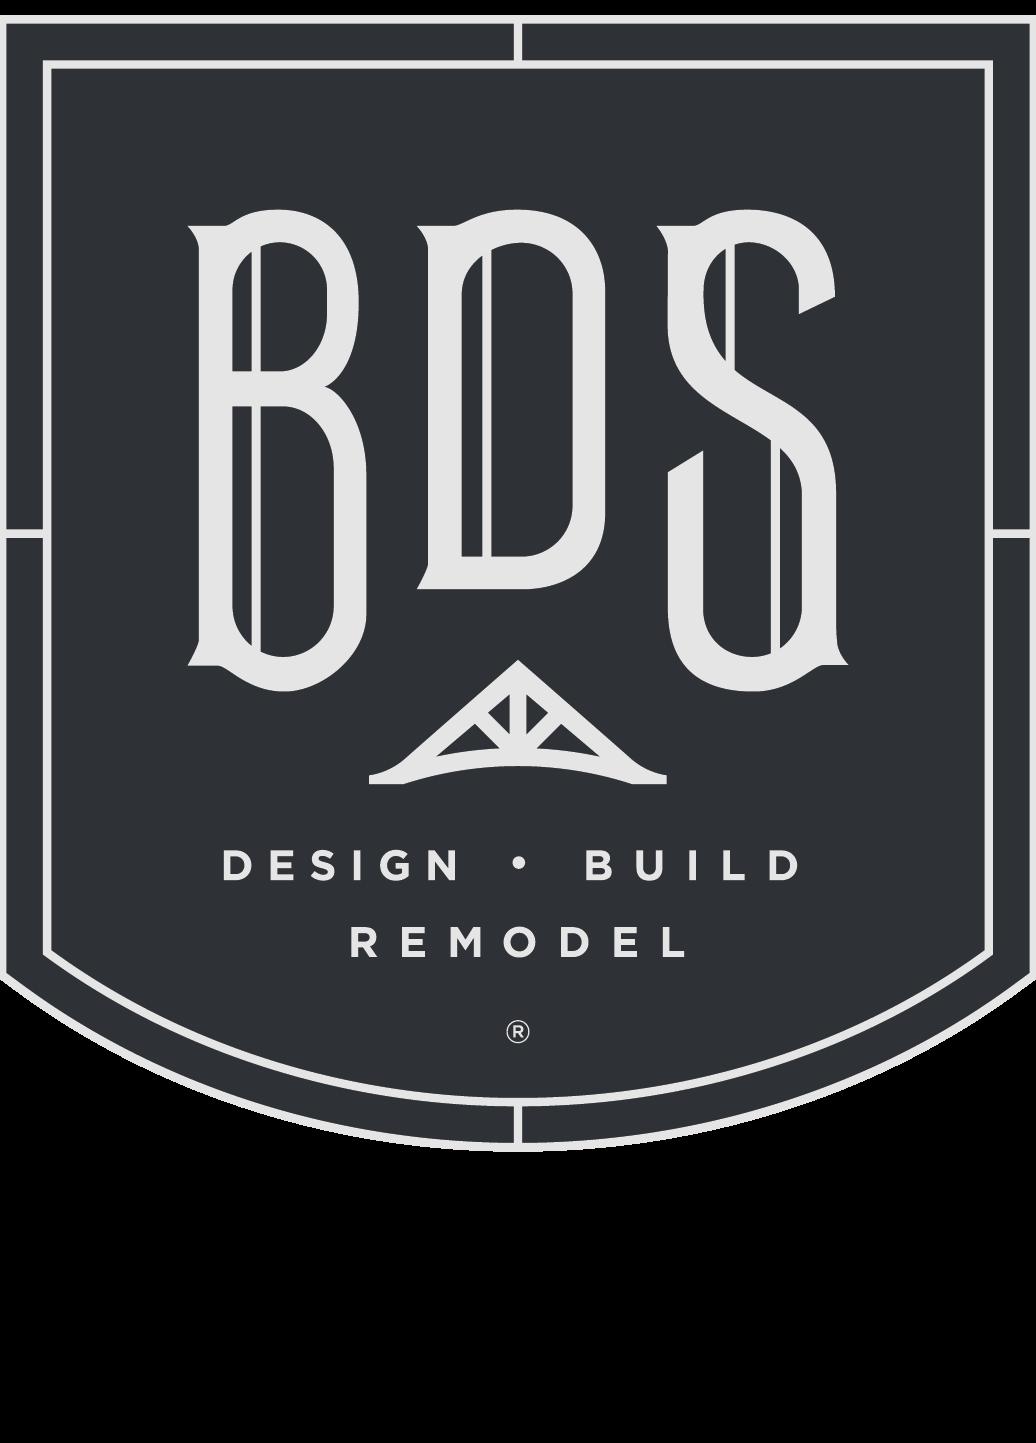 BDS_logo_2018_3.png